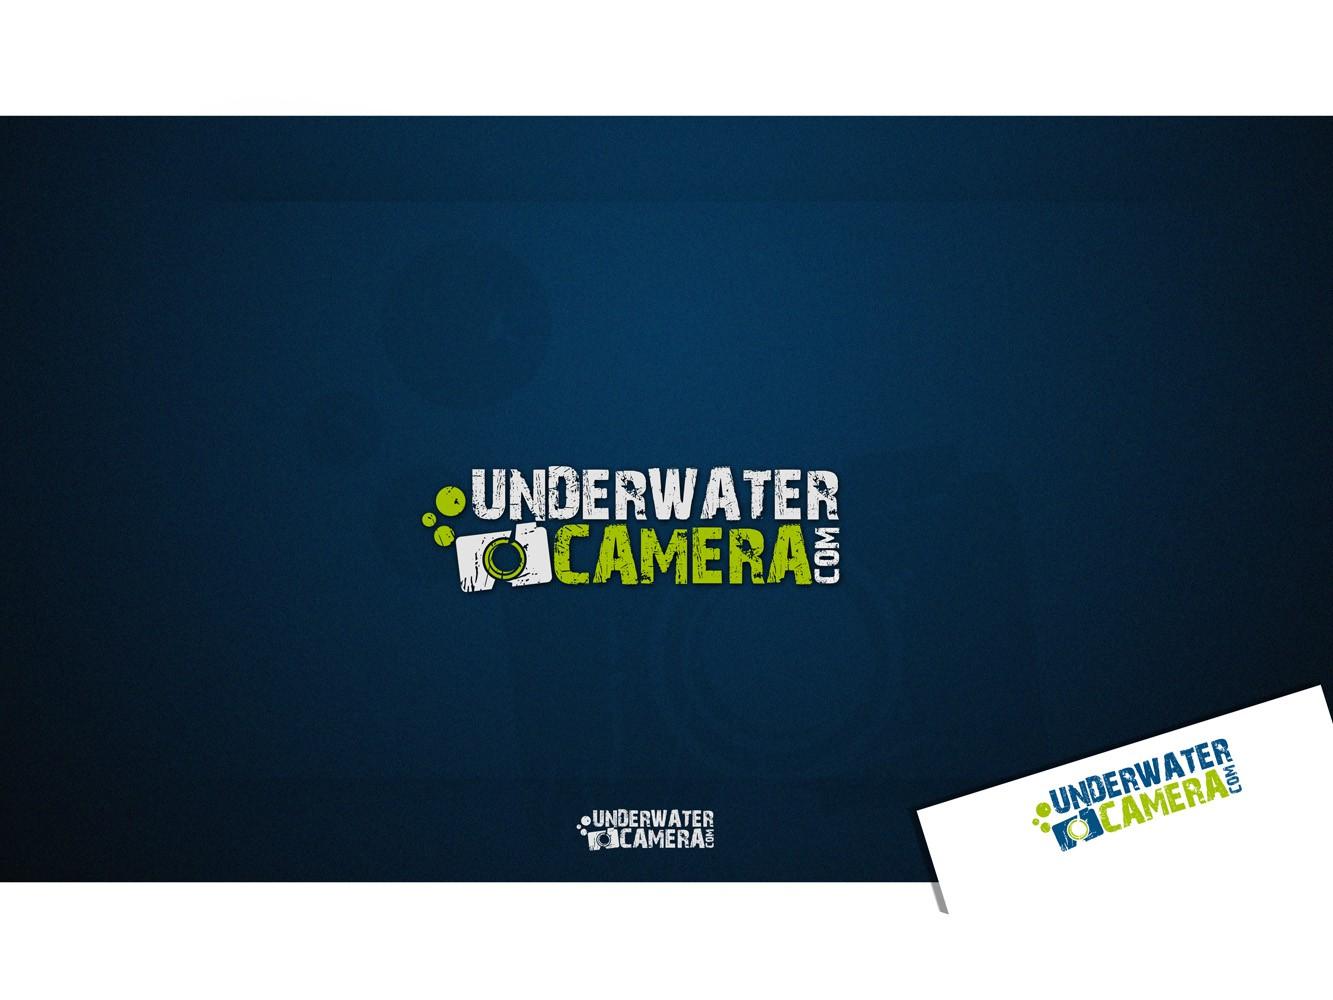 UnderwaterCamera.com Logo Contest!